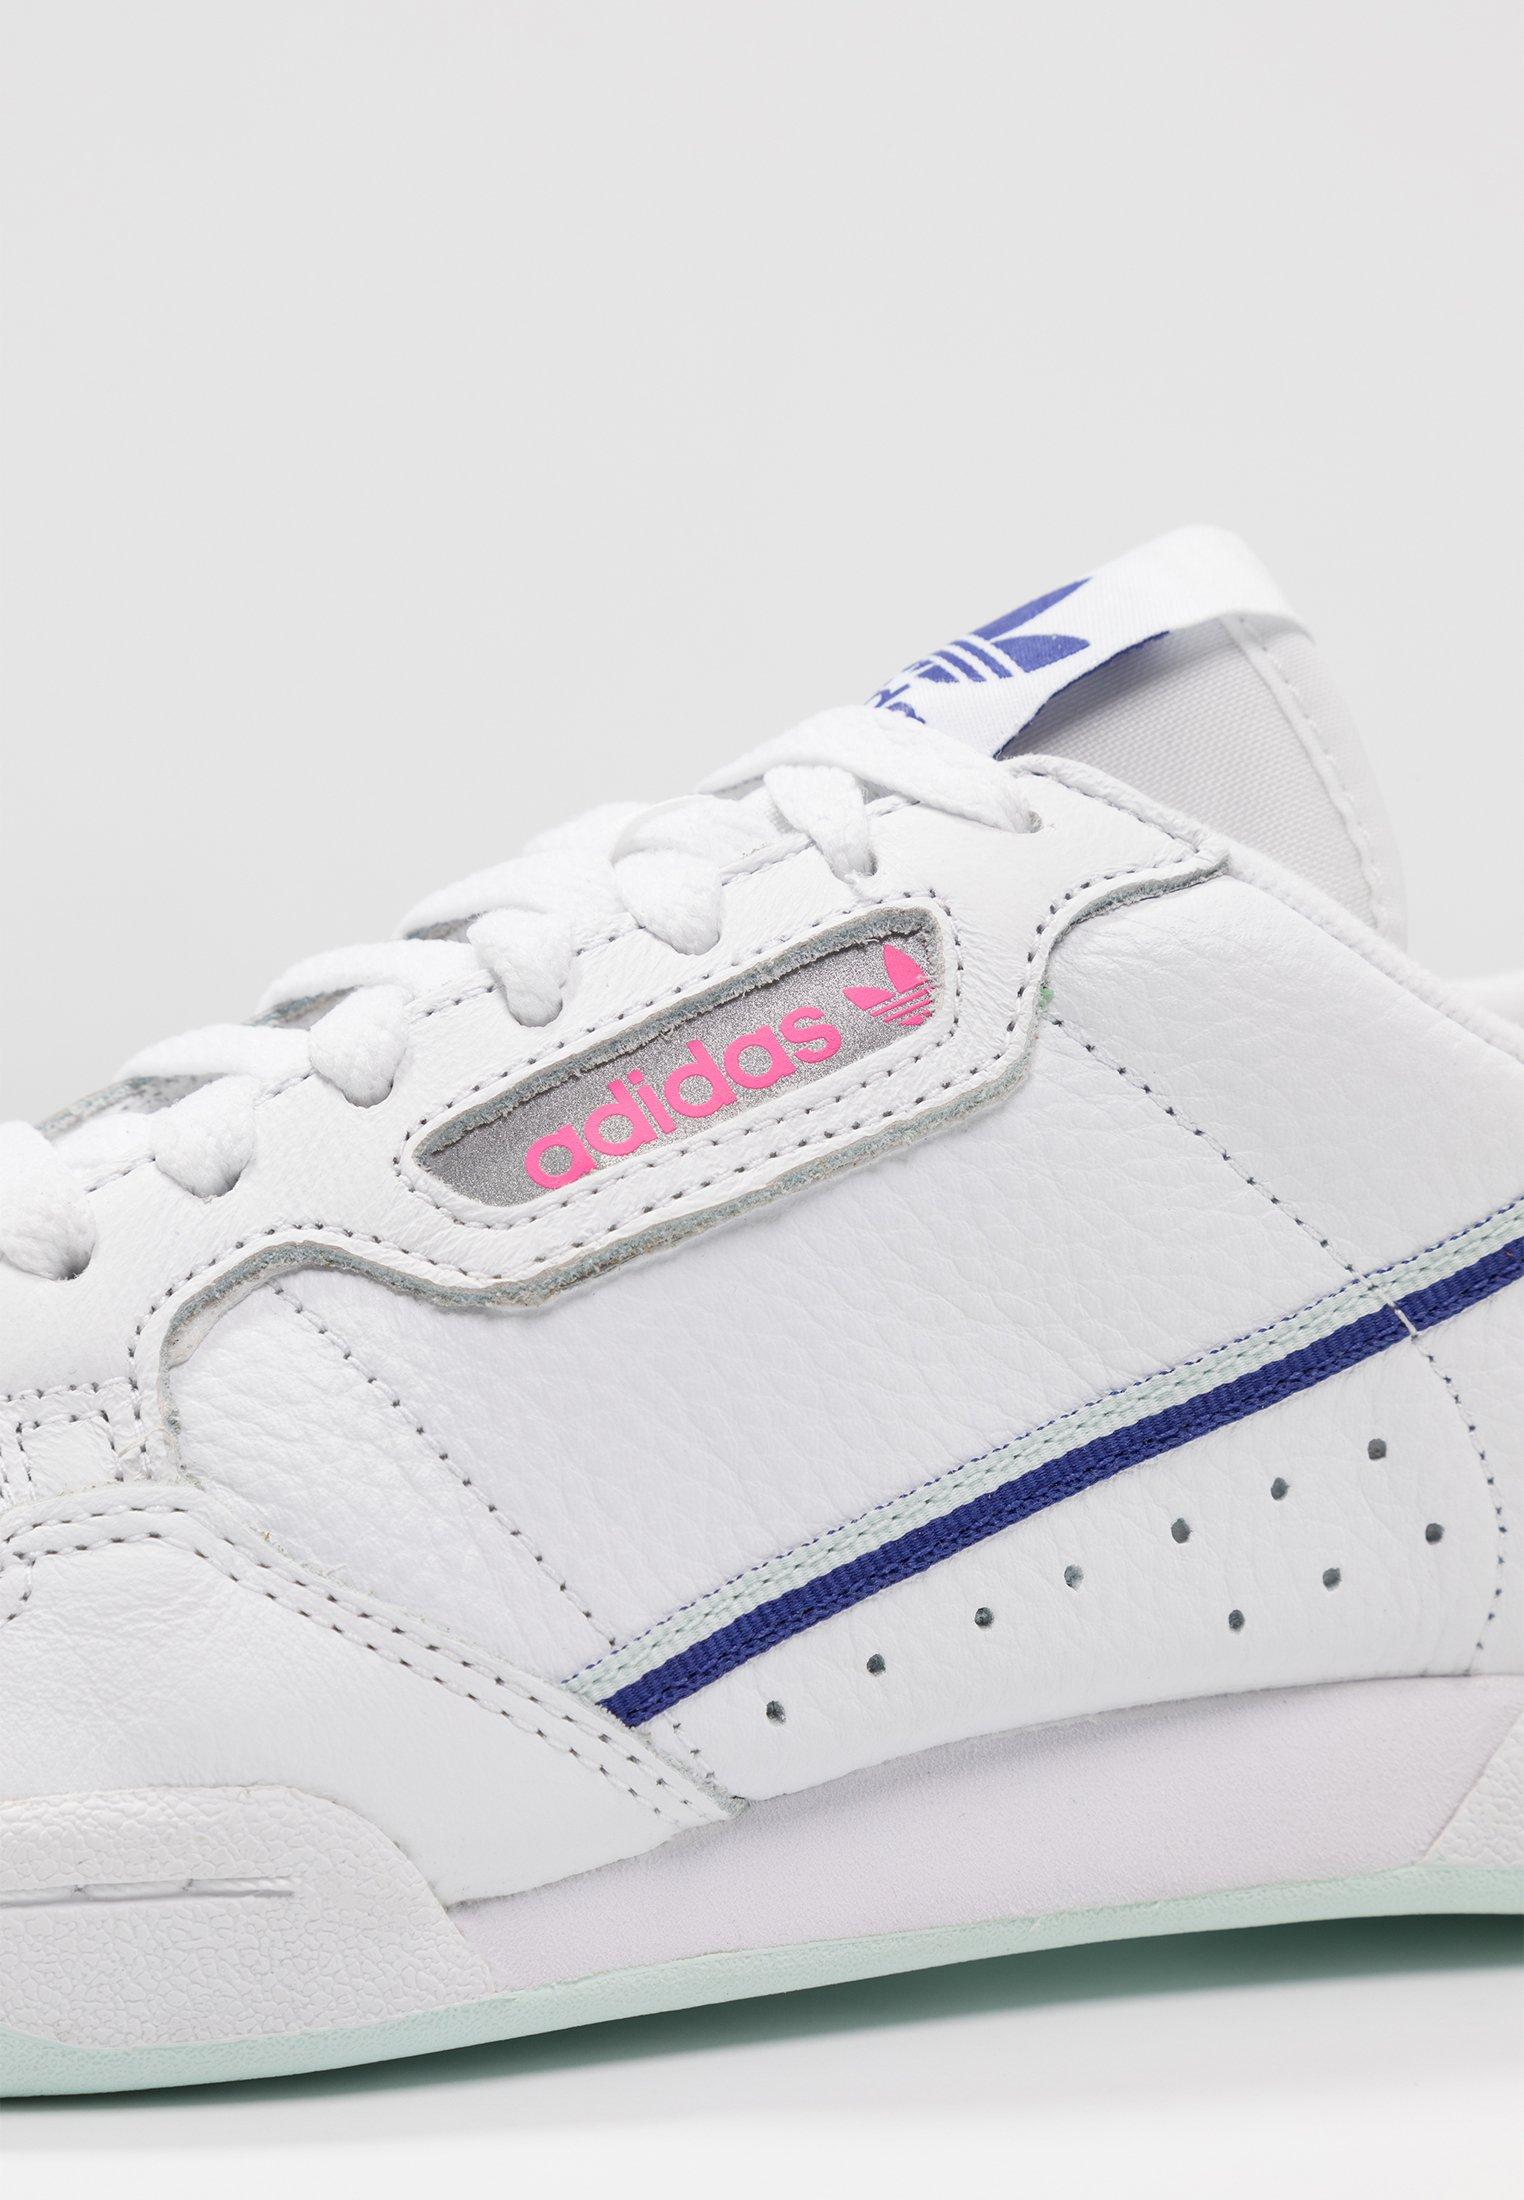 White ice Basses Blue Footwear Mint Adidas Originals Continental 80Baskets active MVGjqSUzpL